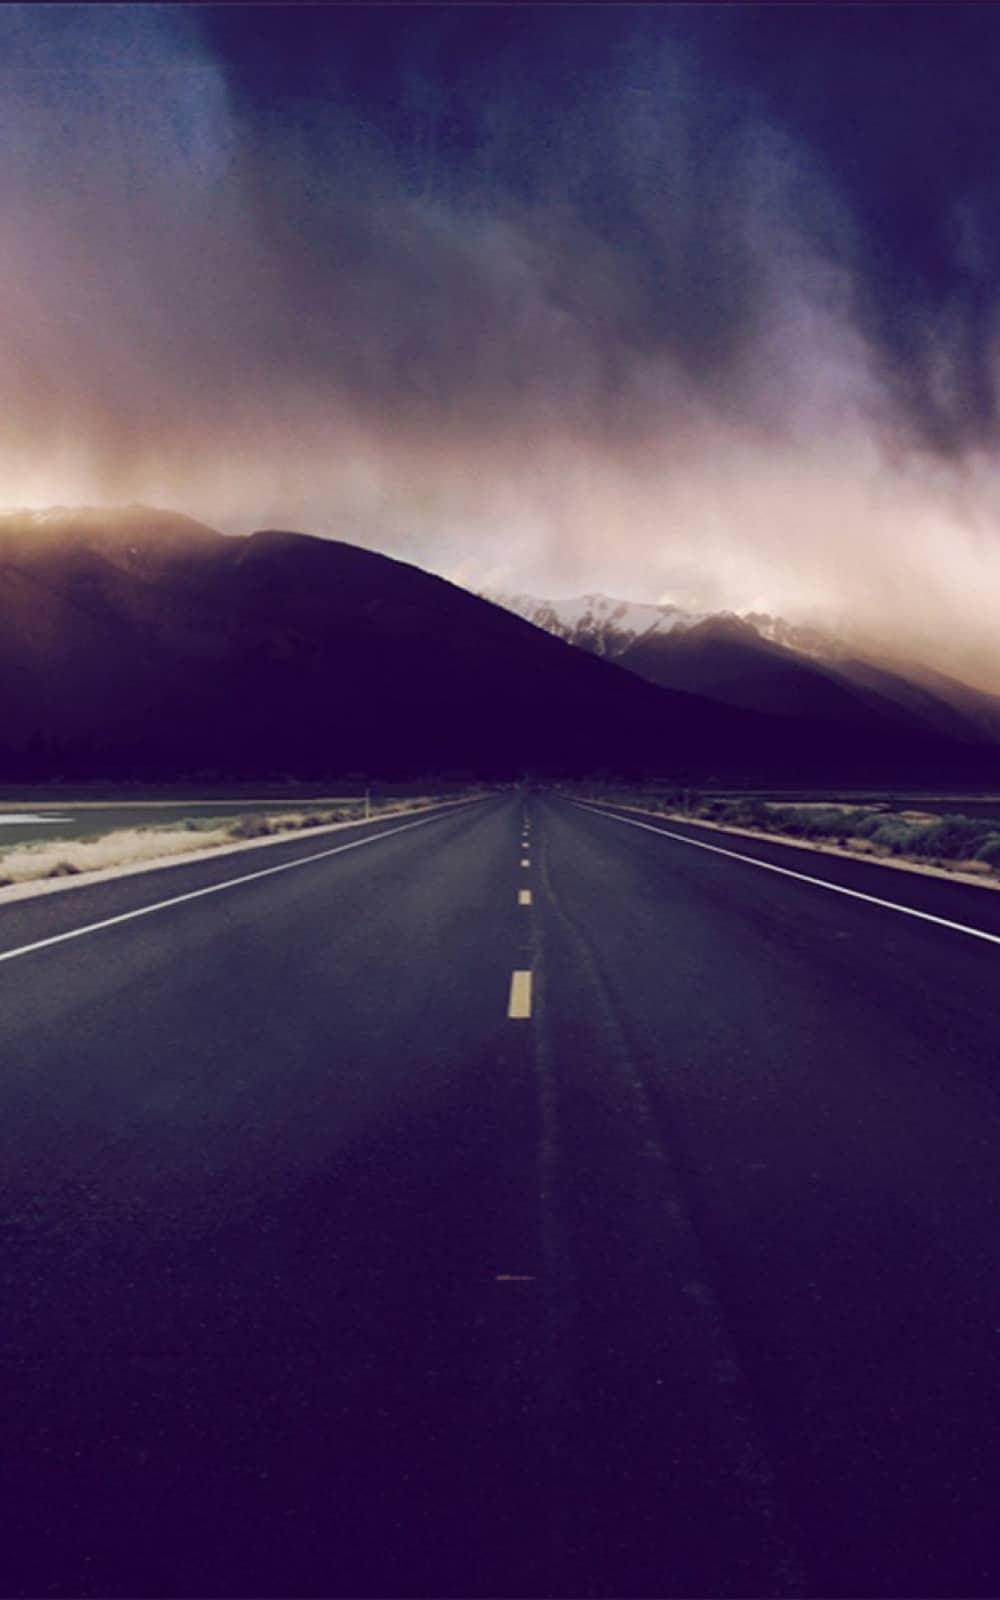 Mountain Highway Foggy Horizon Android Wallpaper